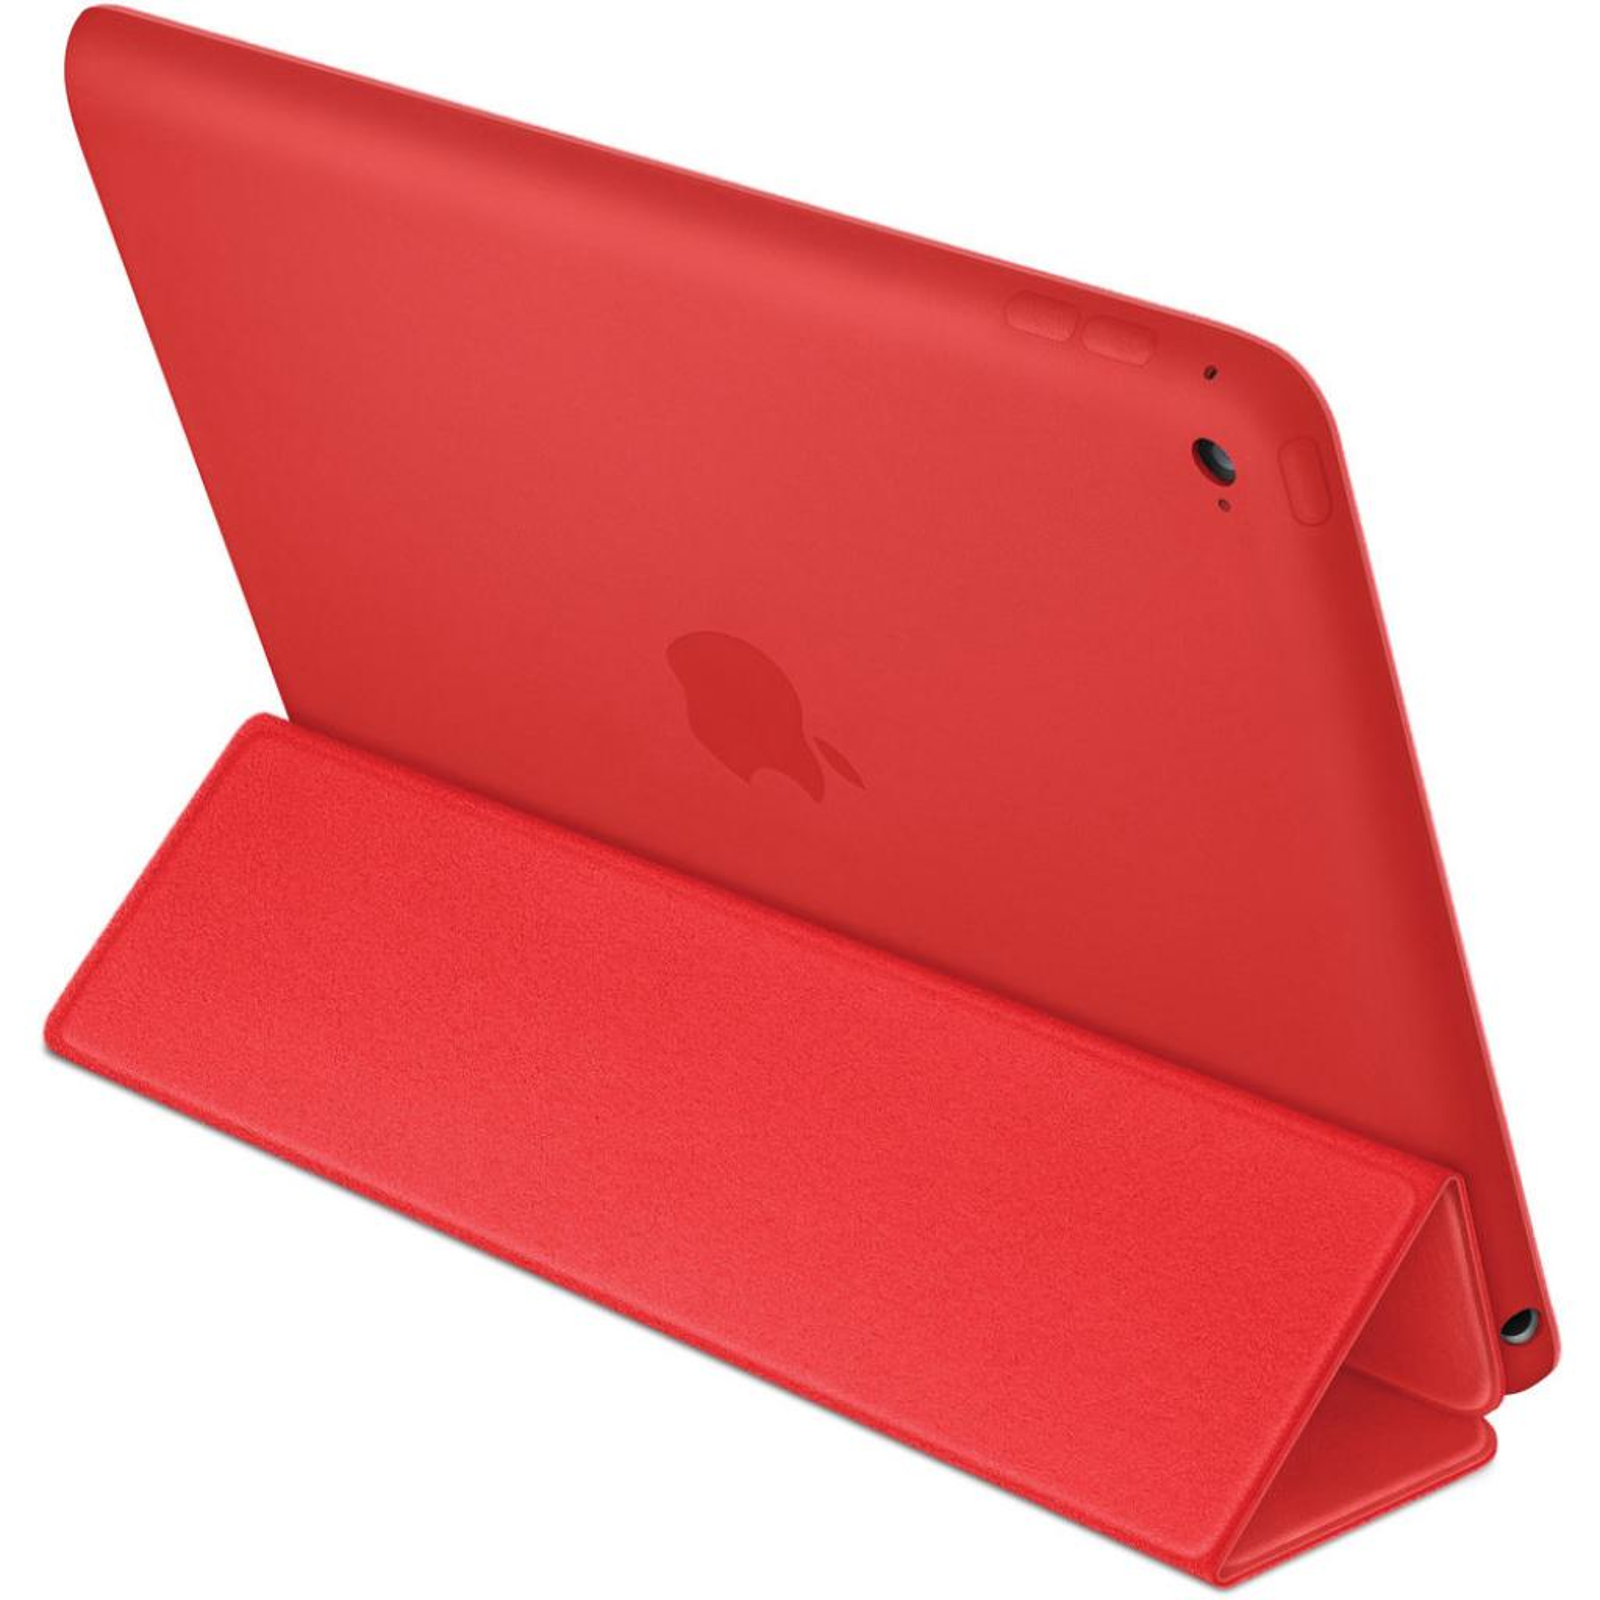 Чехол для планшета Apple Smart Case для iPad Air 2 (bright red) (MGTW2ZM/A) изображение 6